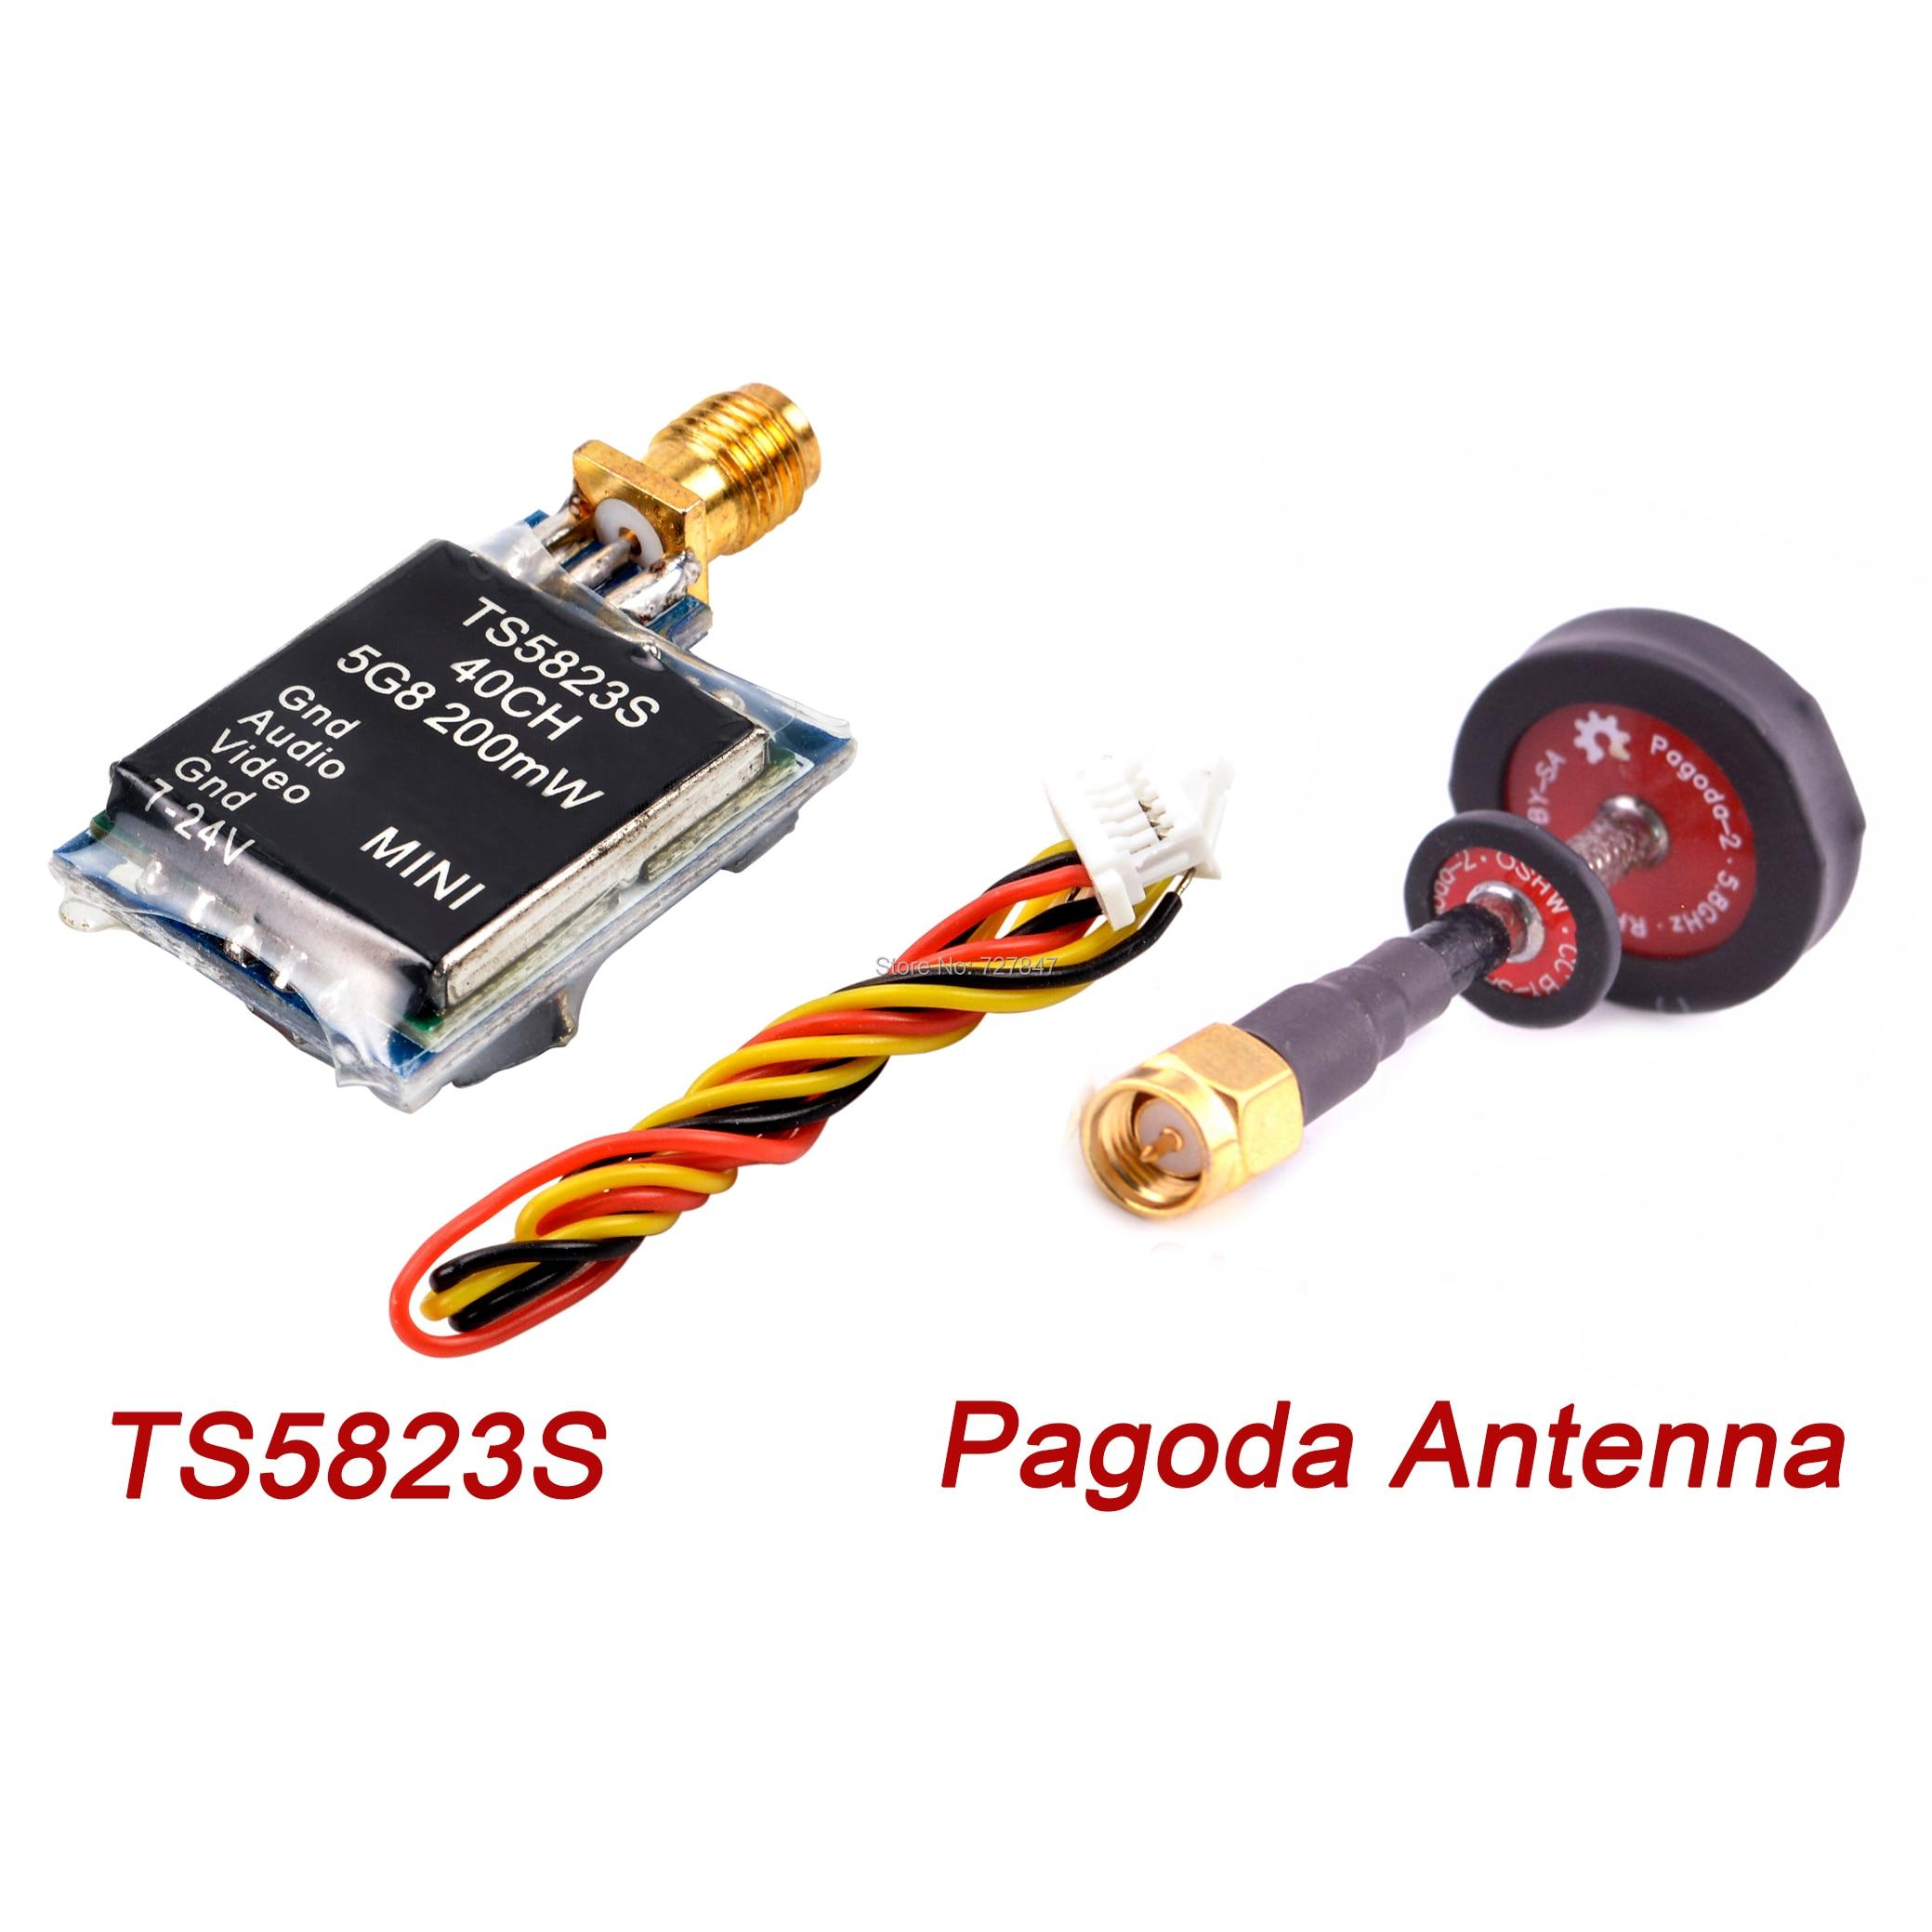 TS5823S TS5823 5.8G 200mW 40CH Mini AV Wireless Transmitter For Multicopter FPV Racing Drone